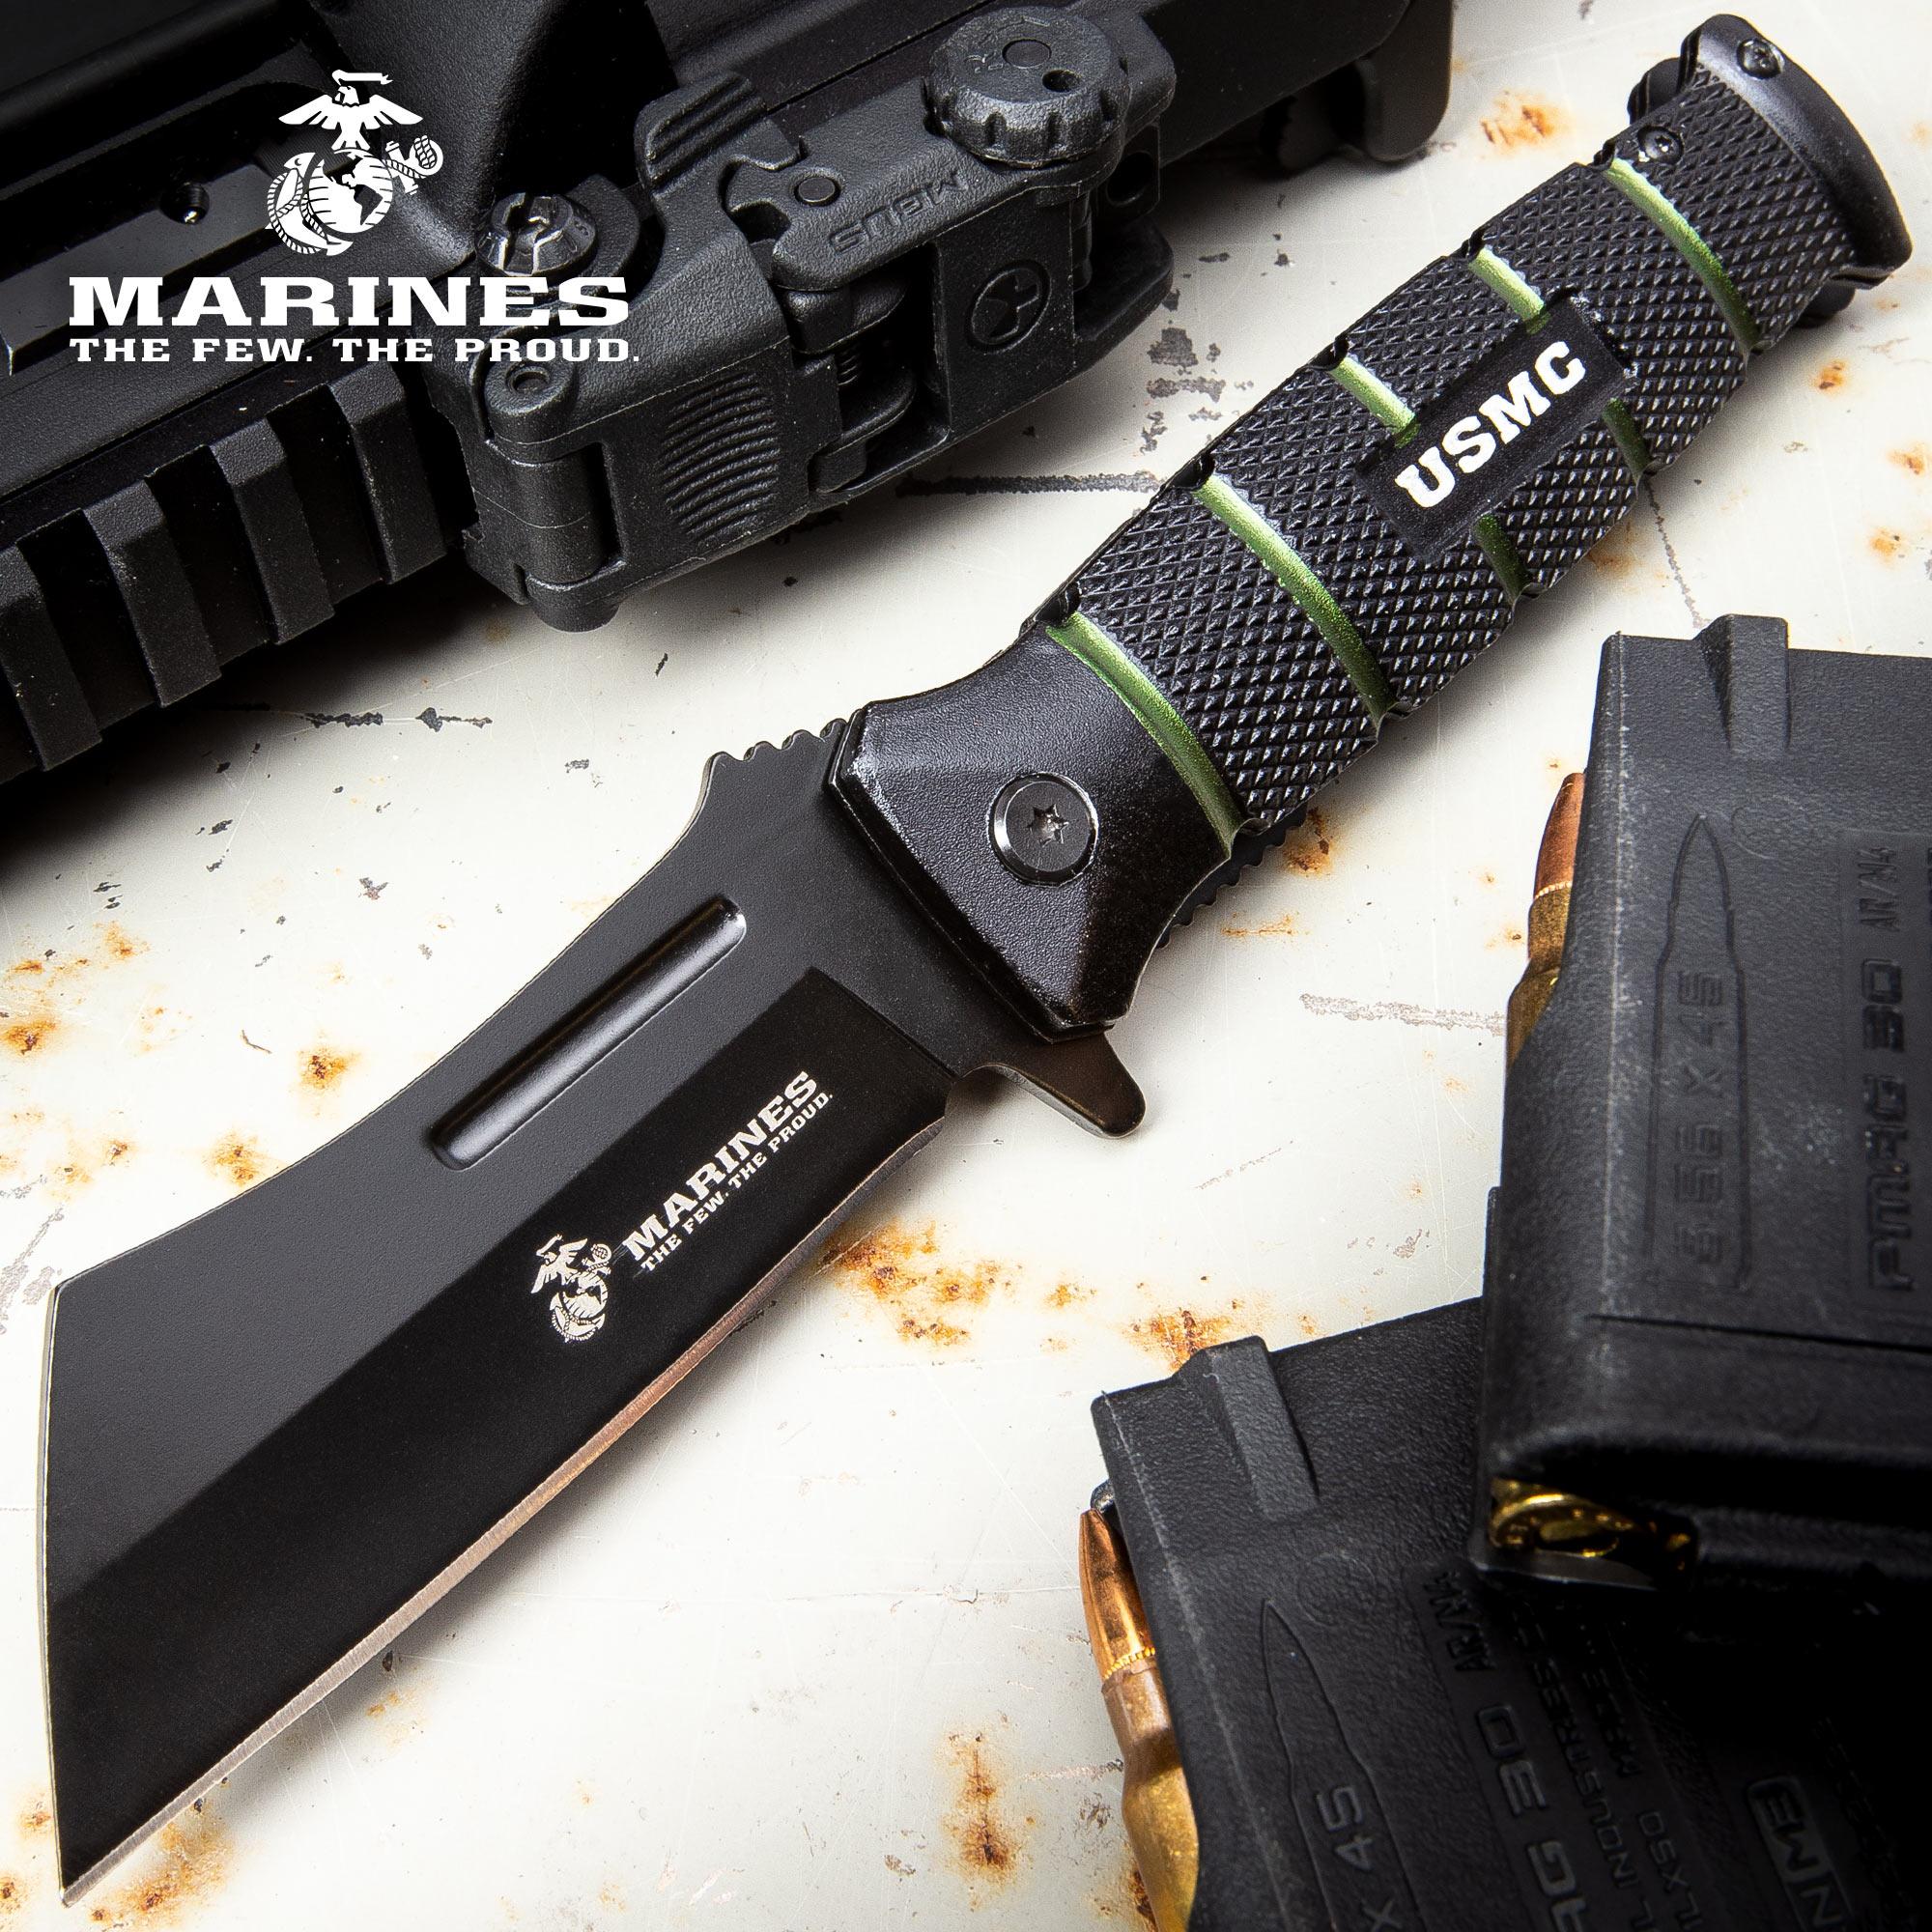 USMC Combat Cleaver Assisted Opening Pocket Knife